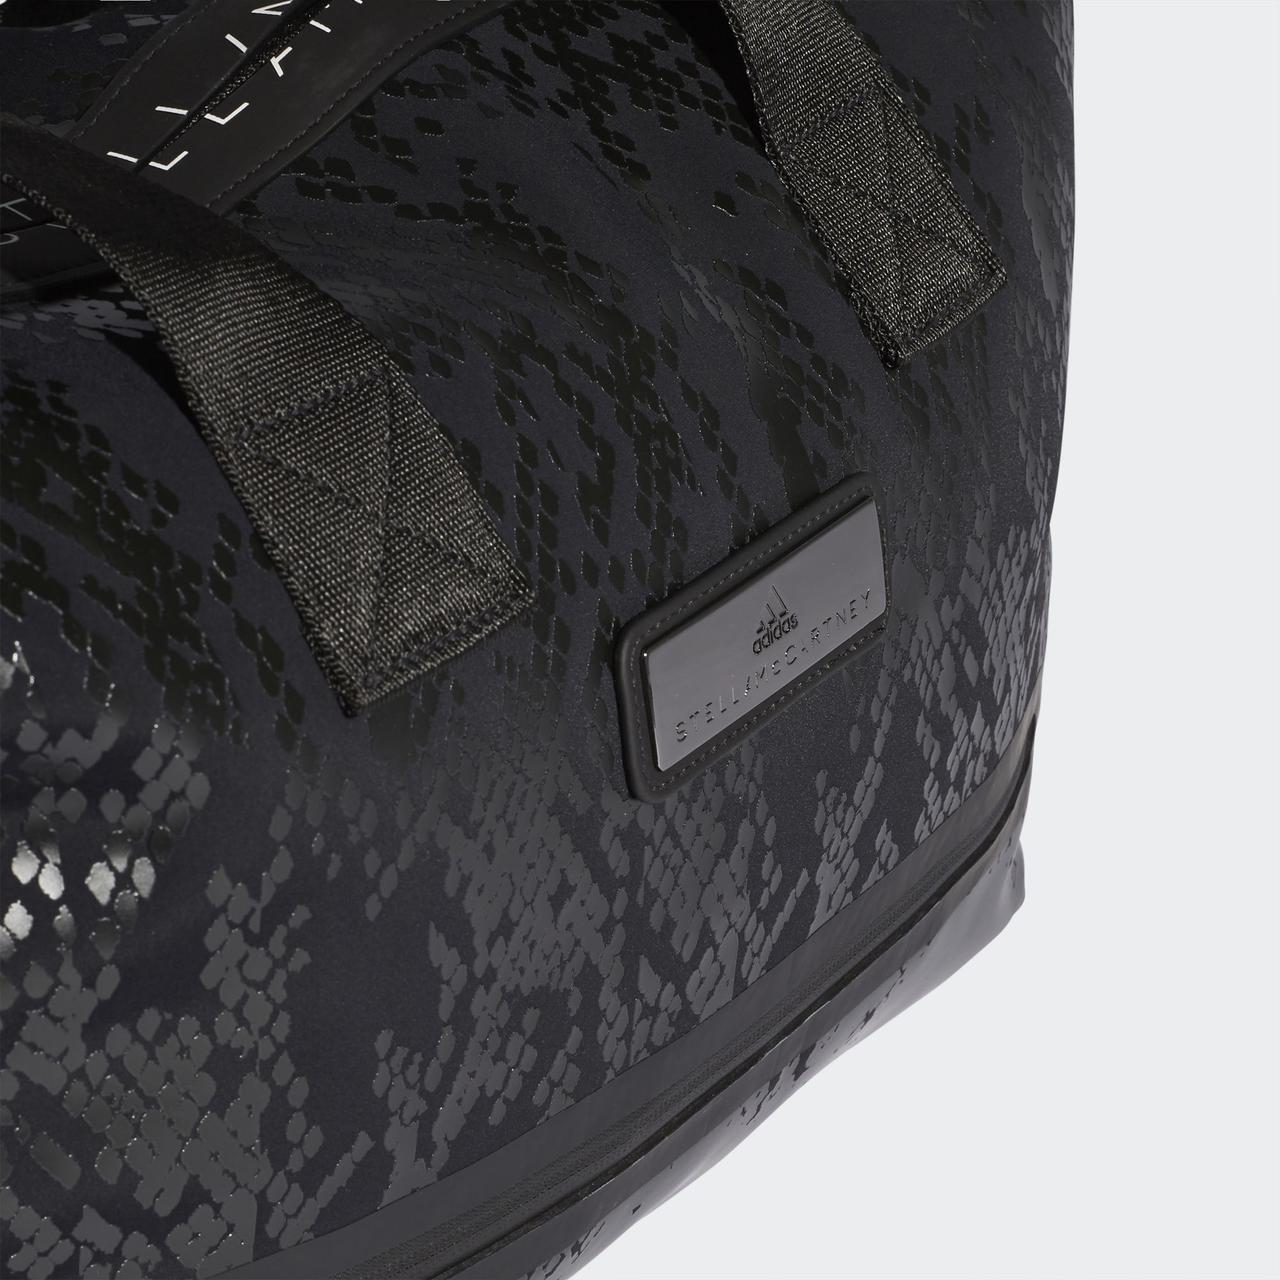 1380056f21fe Женская сумка Adidas Small Studio DT5431 - 2019: продажа, цена в ...